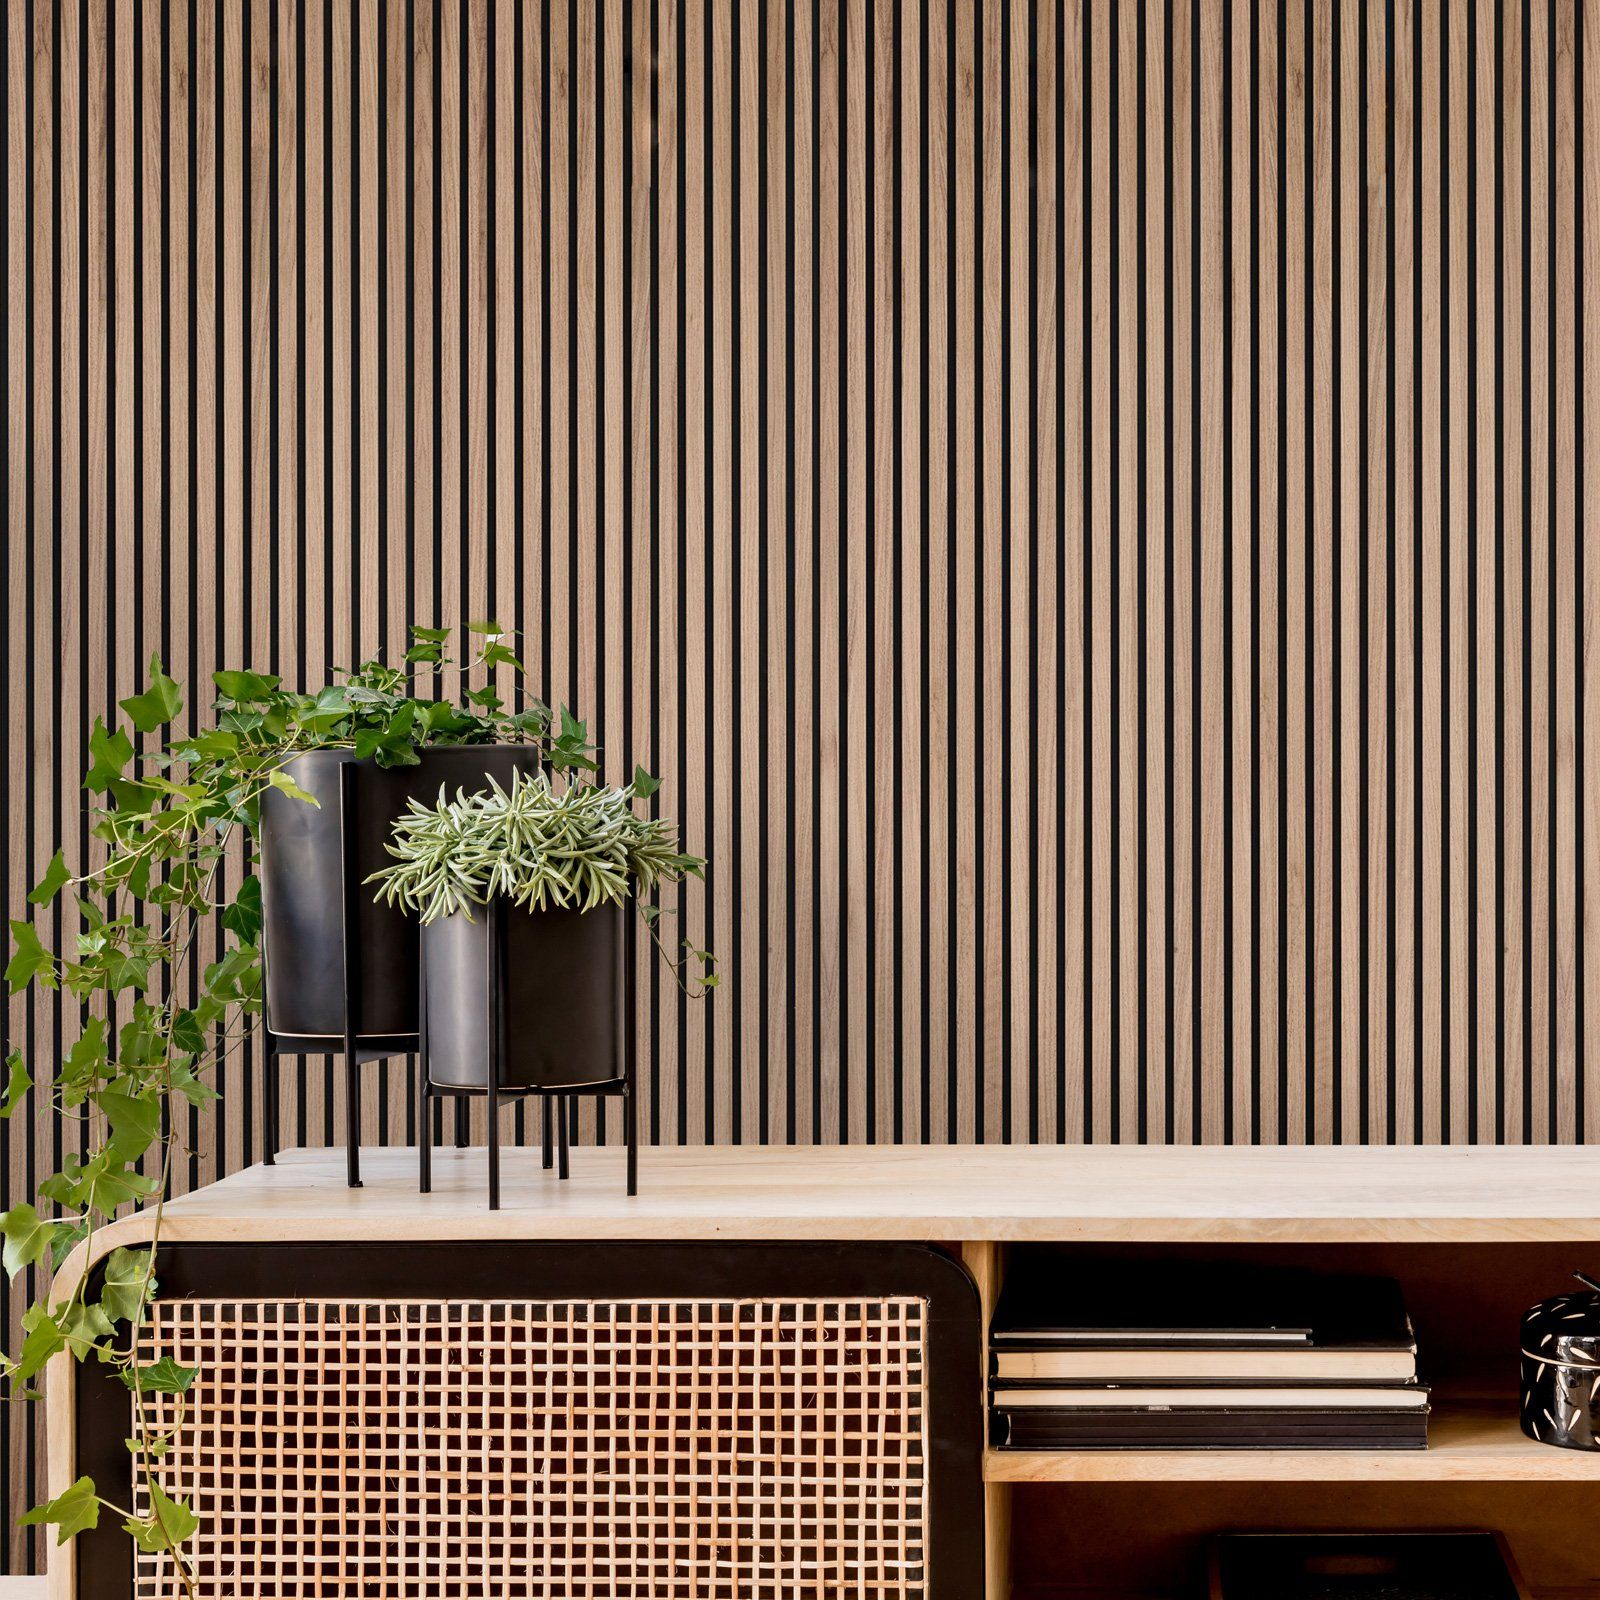 Acupanel Rustic Walnut Acoustic Wood Wall Panels In 2020 Wood Slat Wall Modern Wall Paneling Wood Panel Walls